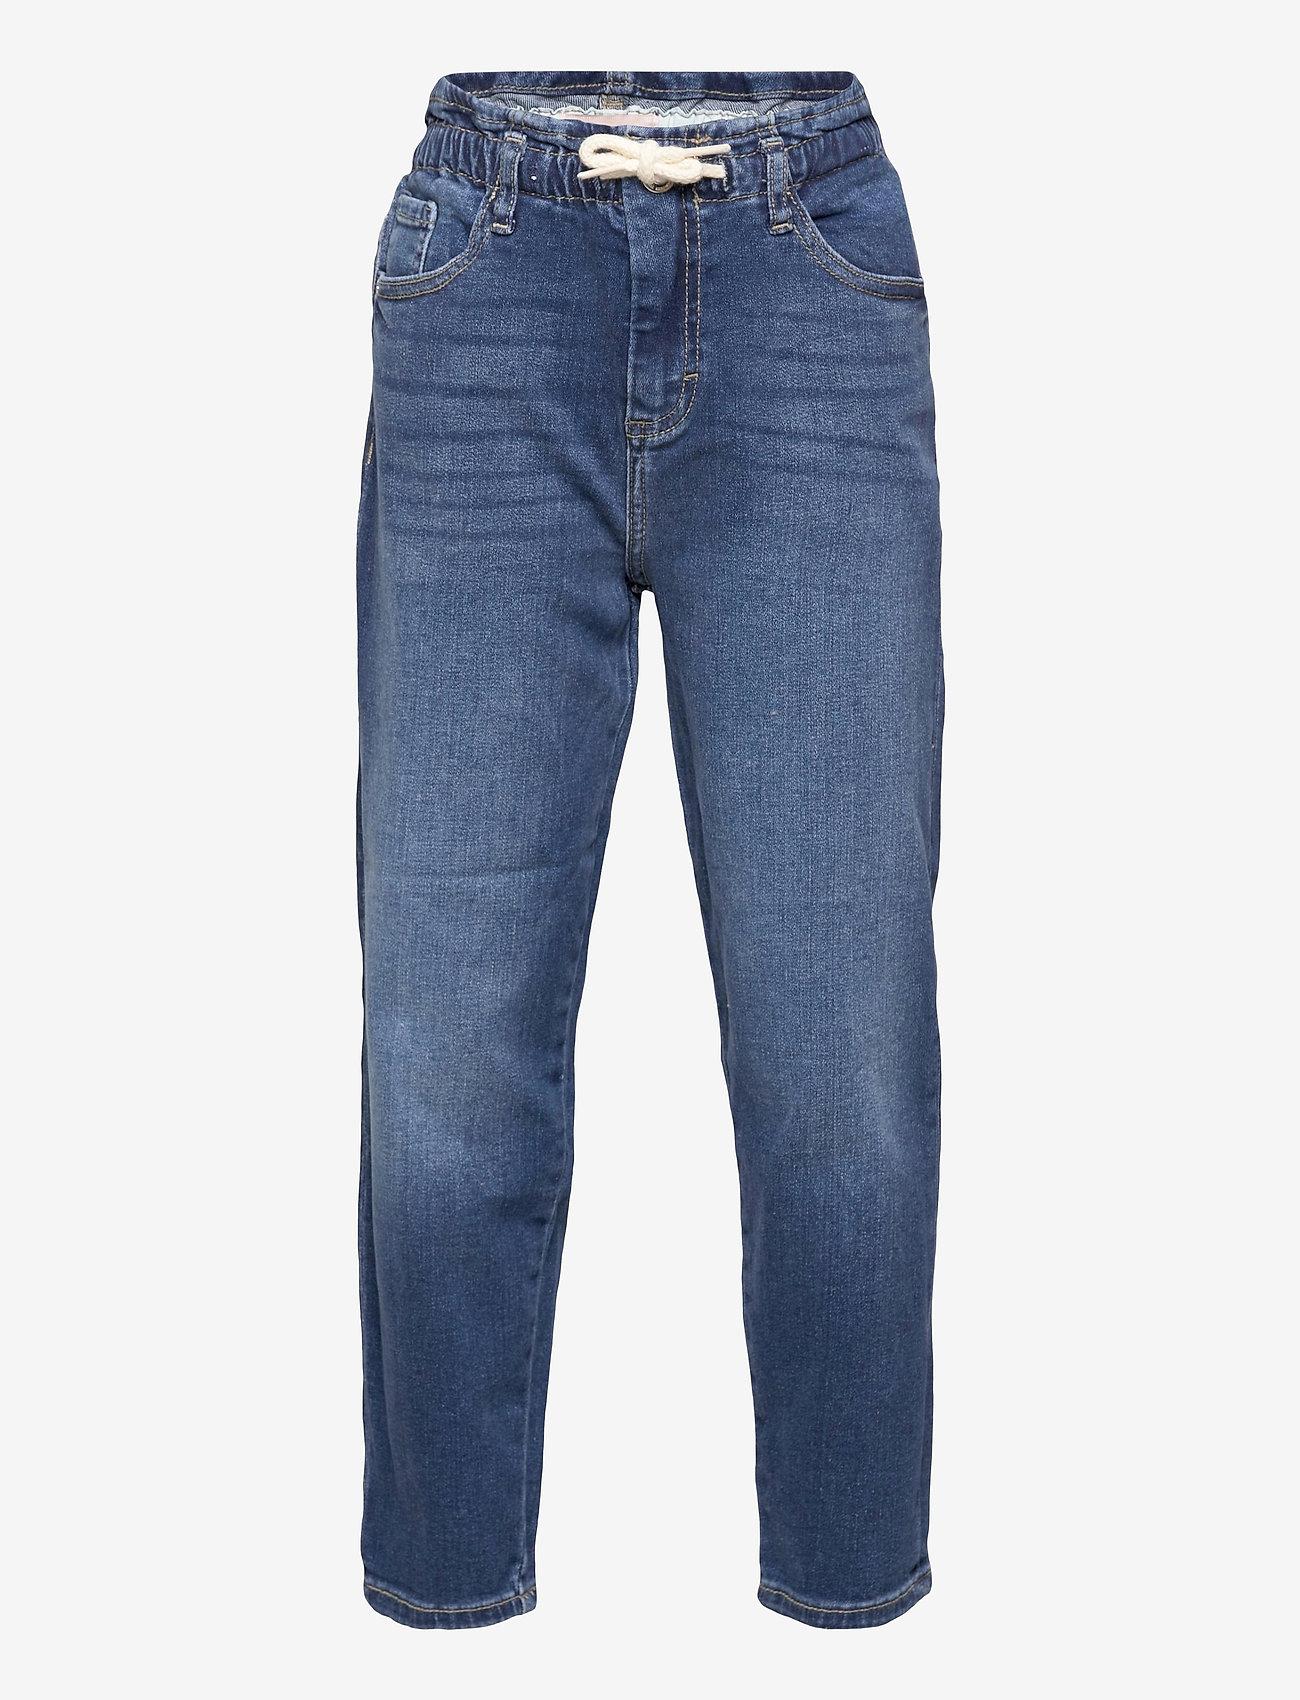 Kids Only - KONMAYA PAPERBAG DNM JEANS AZG - jeans - medium blue denim - 0